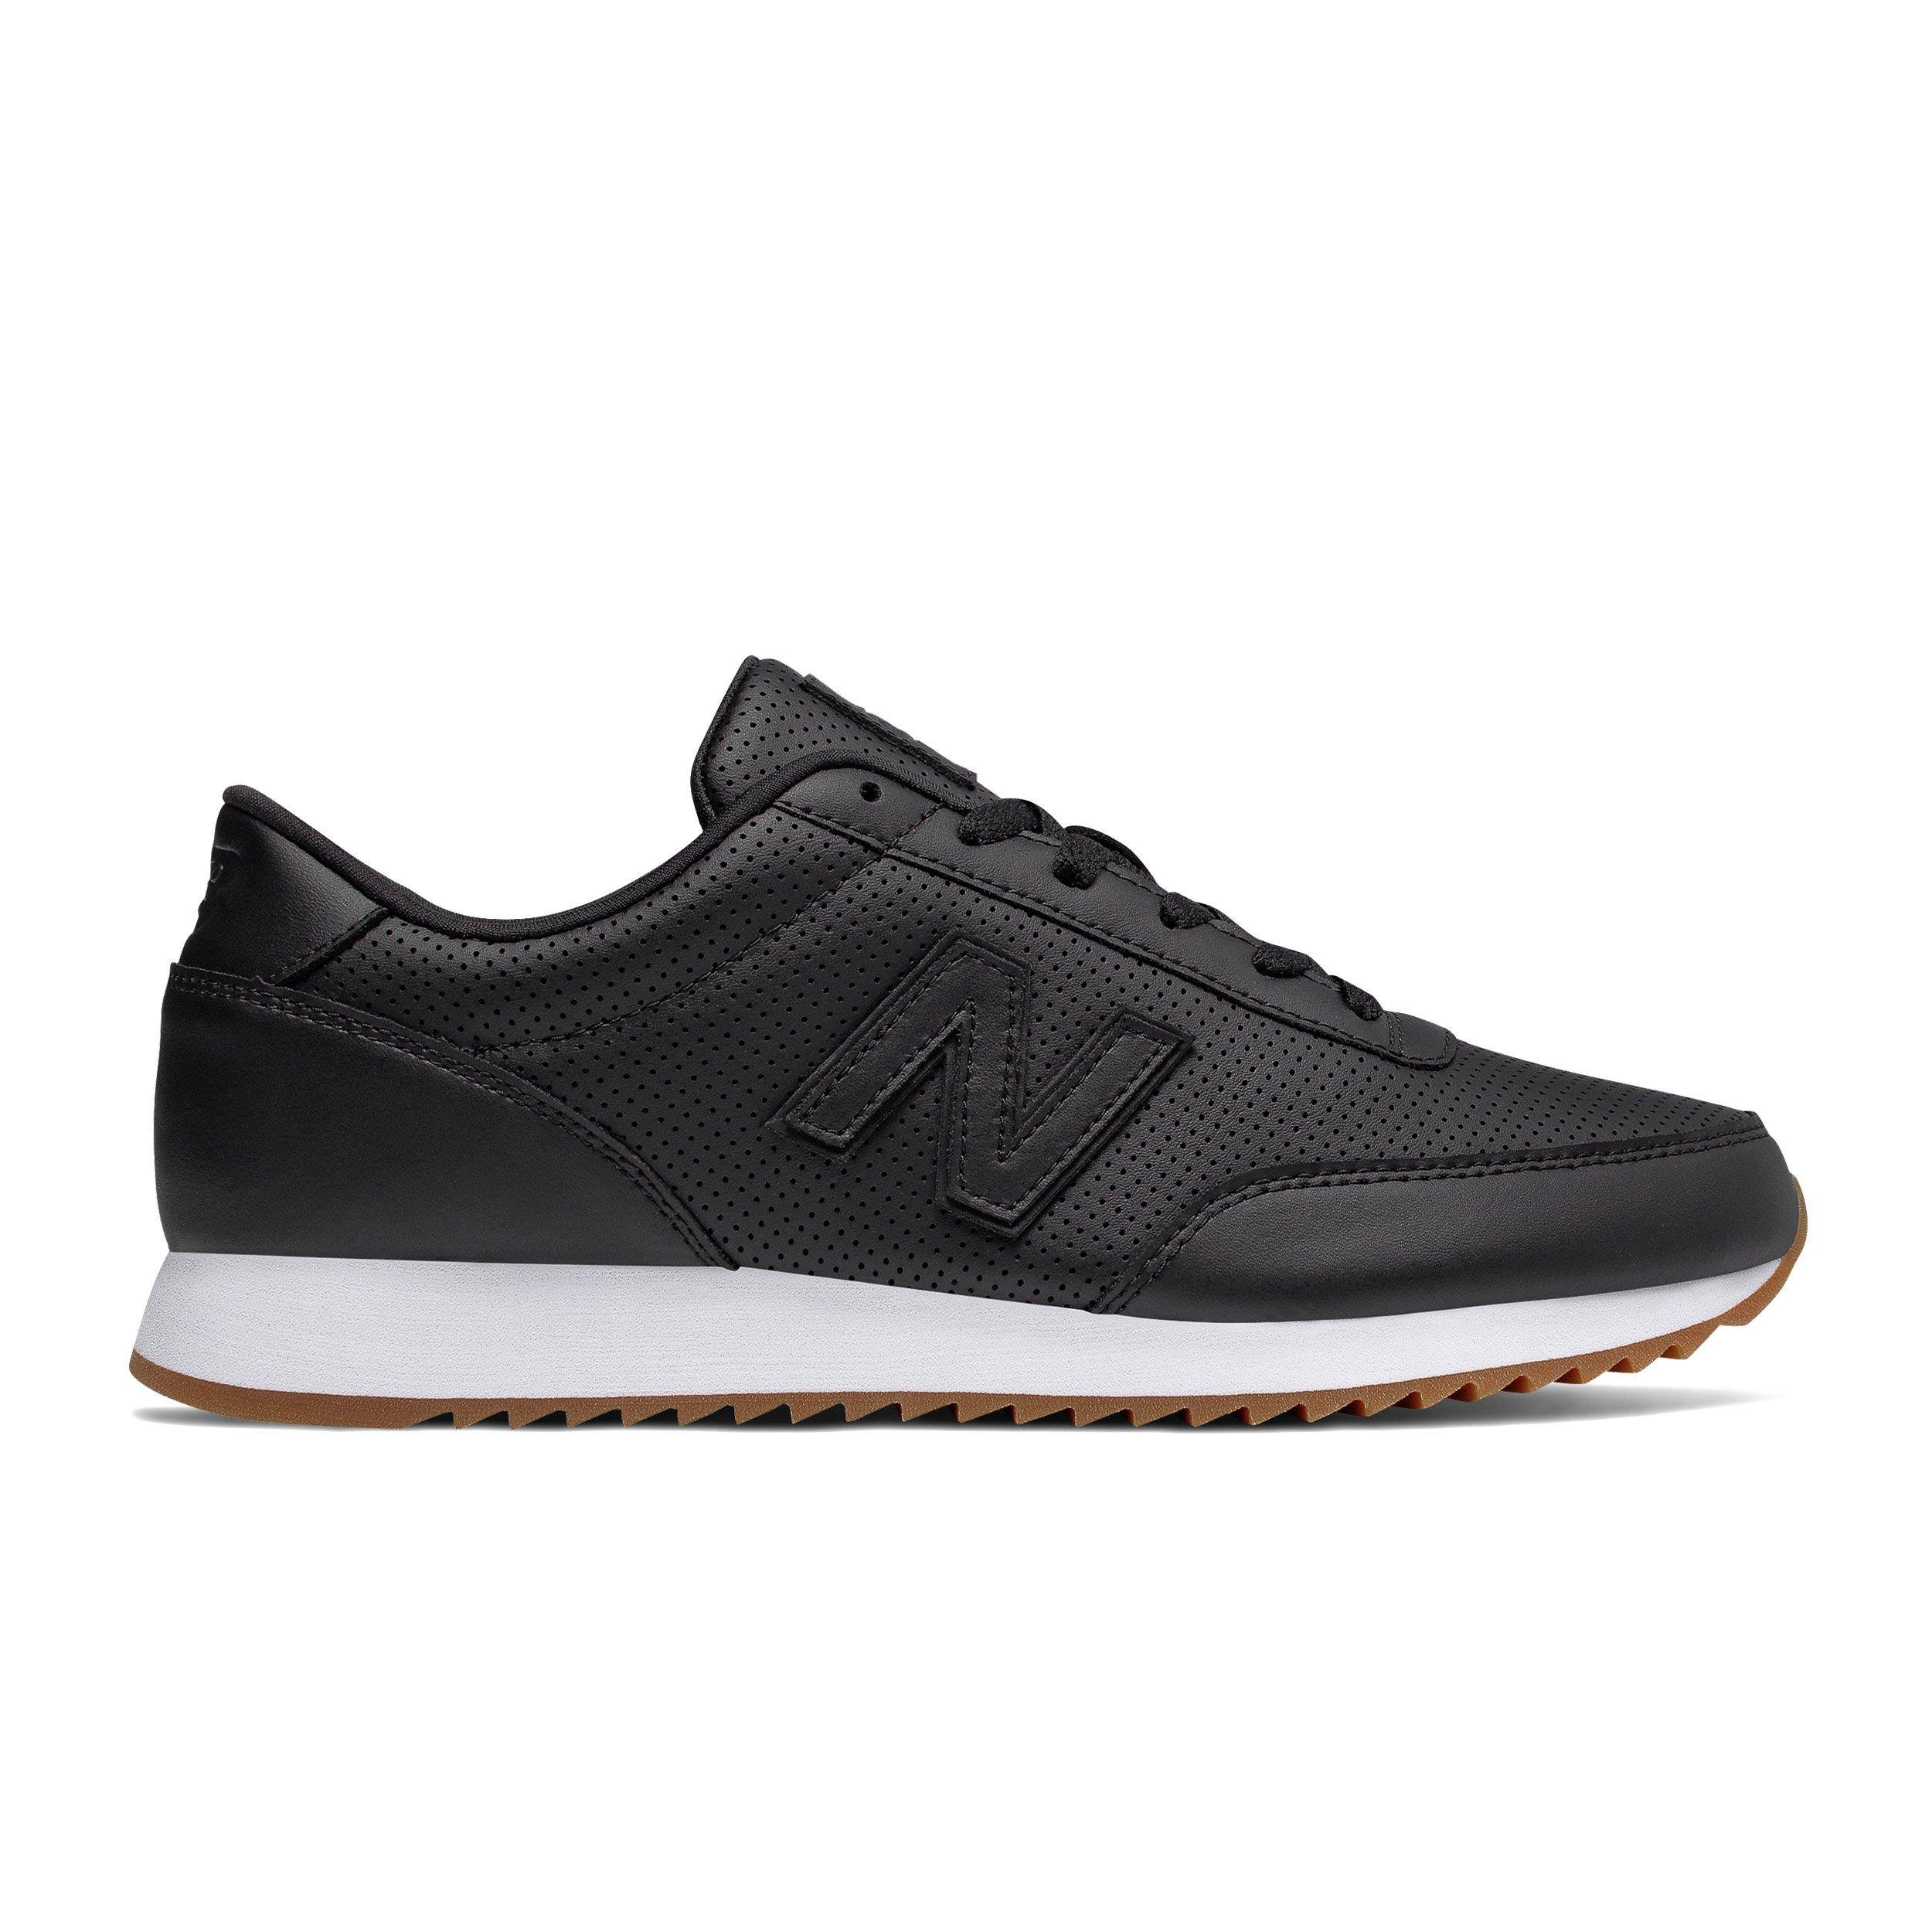 Leather 501 Sneakers Men's Balance New white Black Mens 10m qztwEOE1x